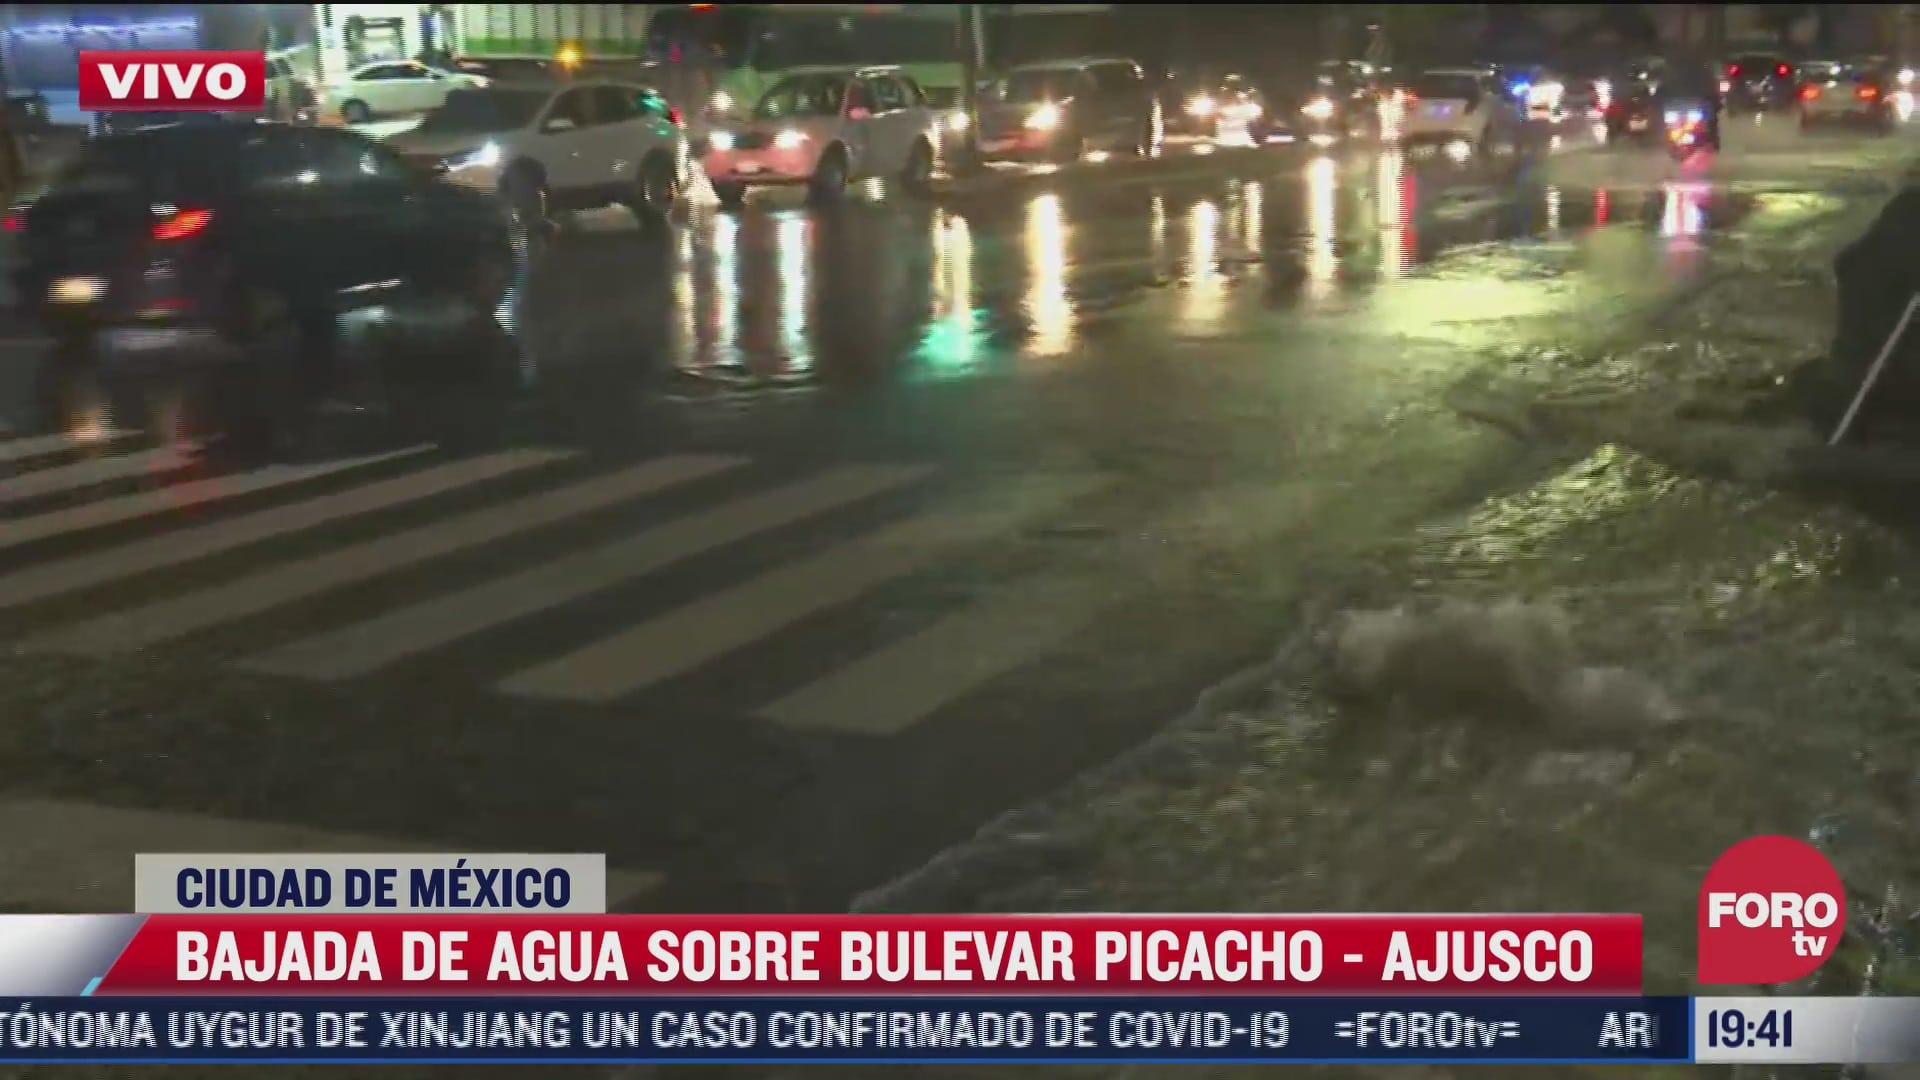 video se reportan bajadas de agua en bulevar picacho ajusco